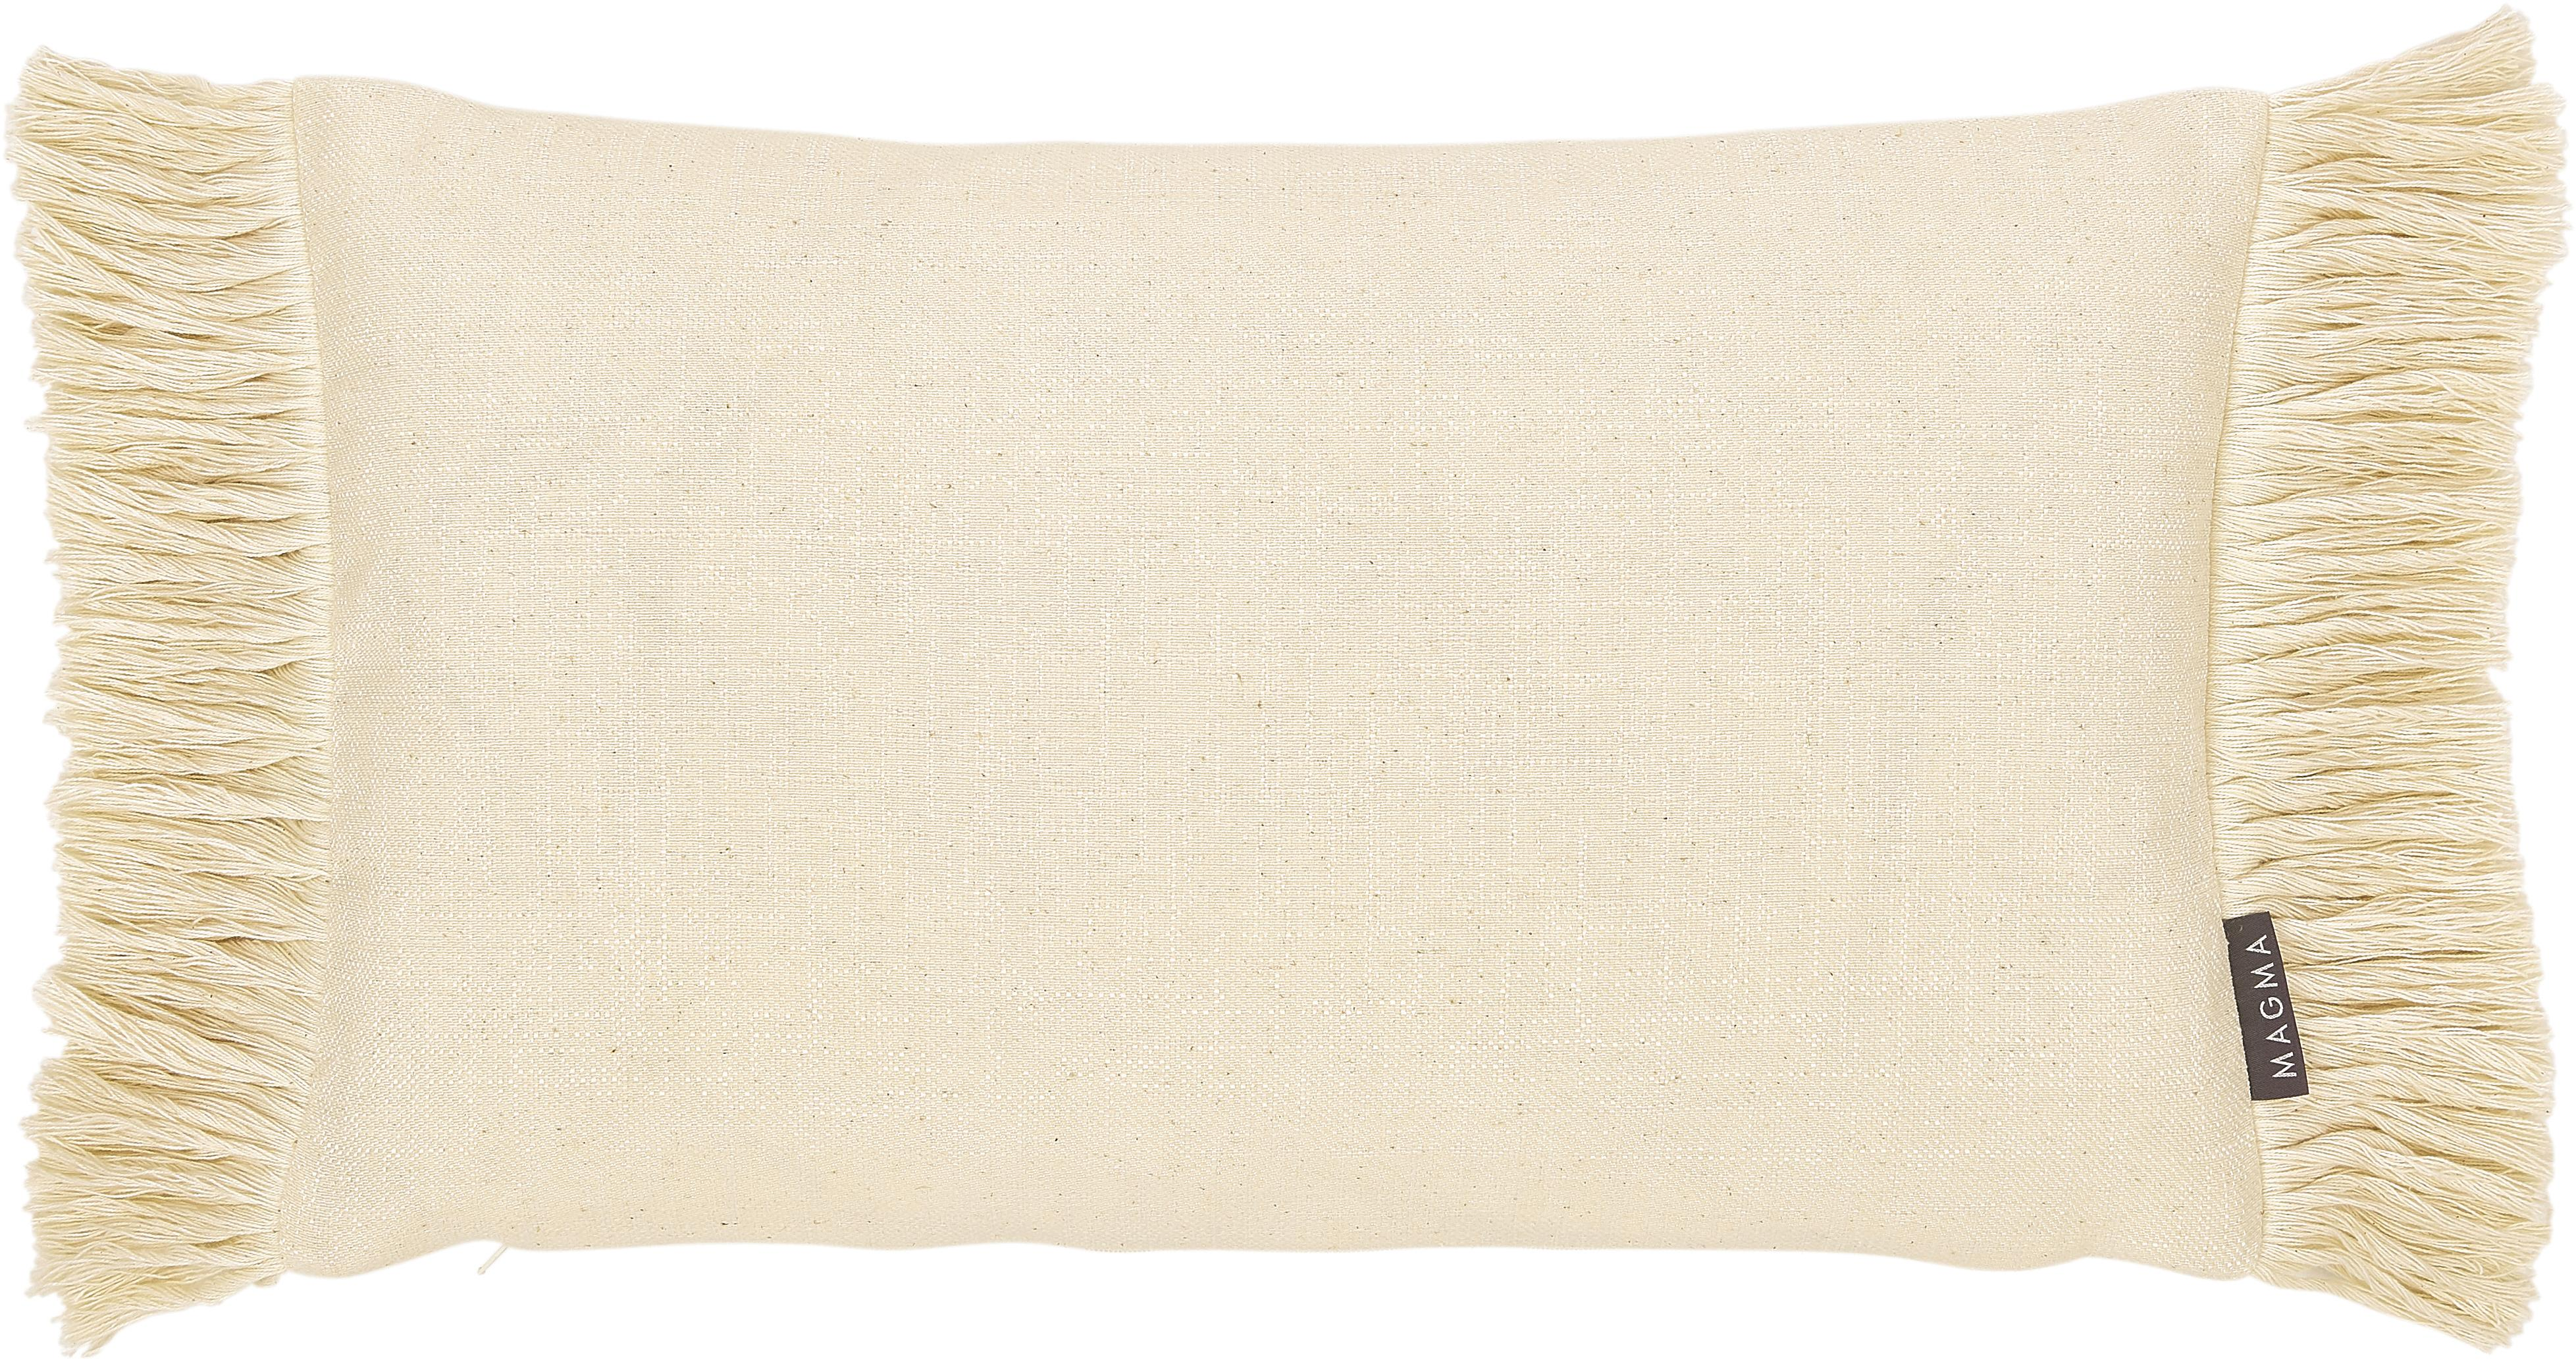 Federa arredo con frange Tine, Beige, Larg. 30 x Lung. 50 cm